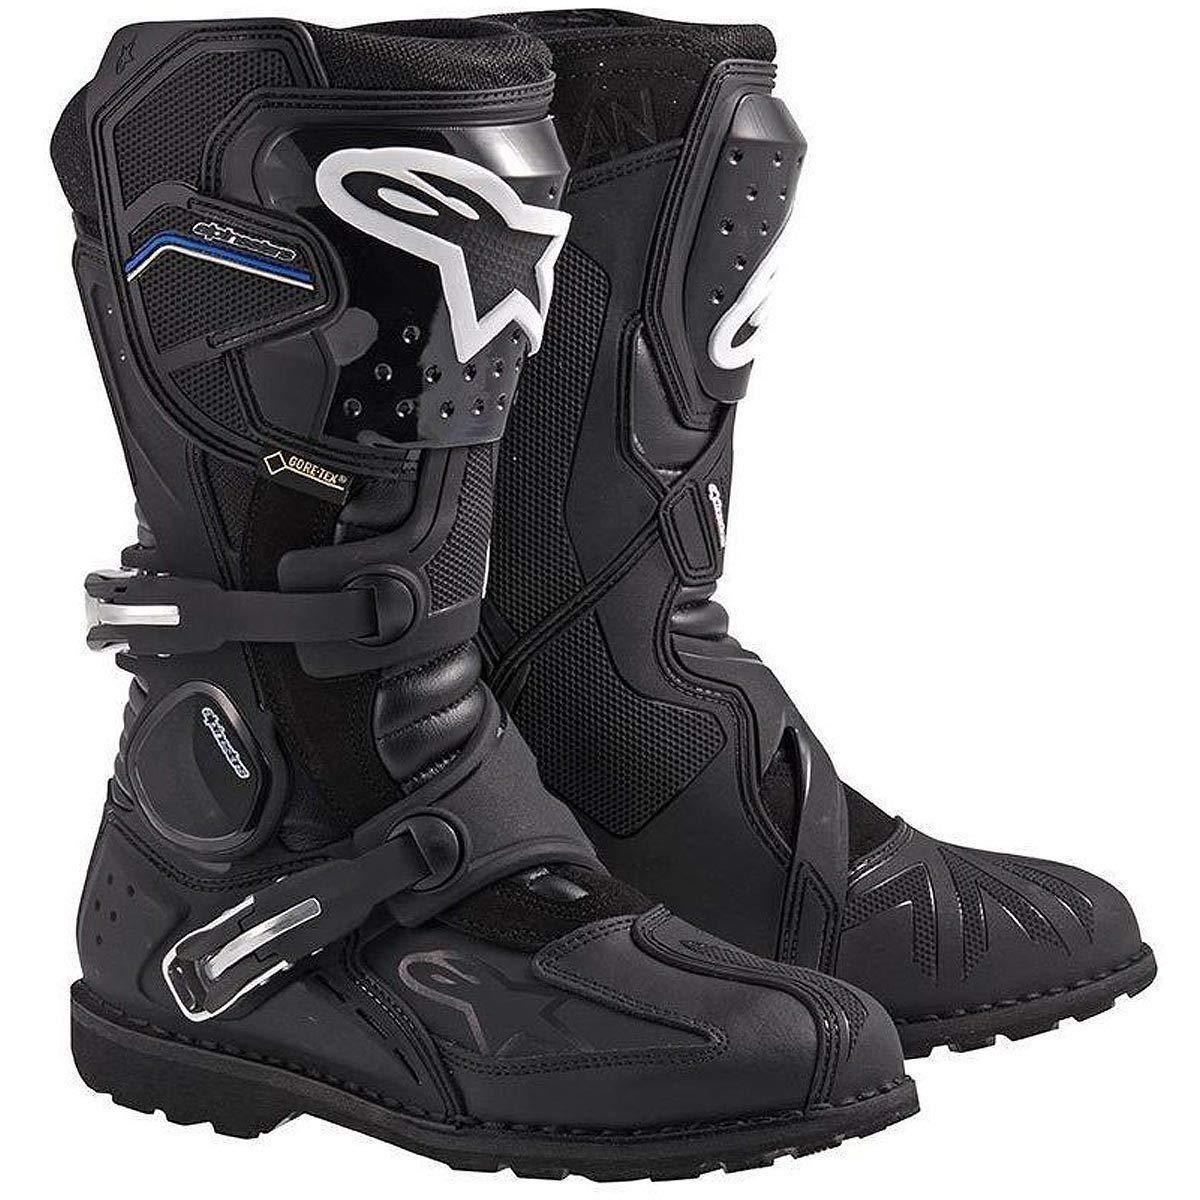 Alpinestars Toucan Gore-Tex Men's Weatherproof Motorcycle Touring Boots (Black, US Size 10)